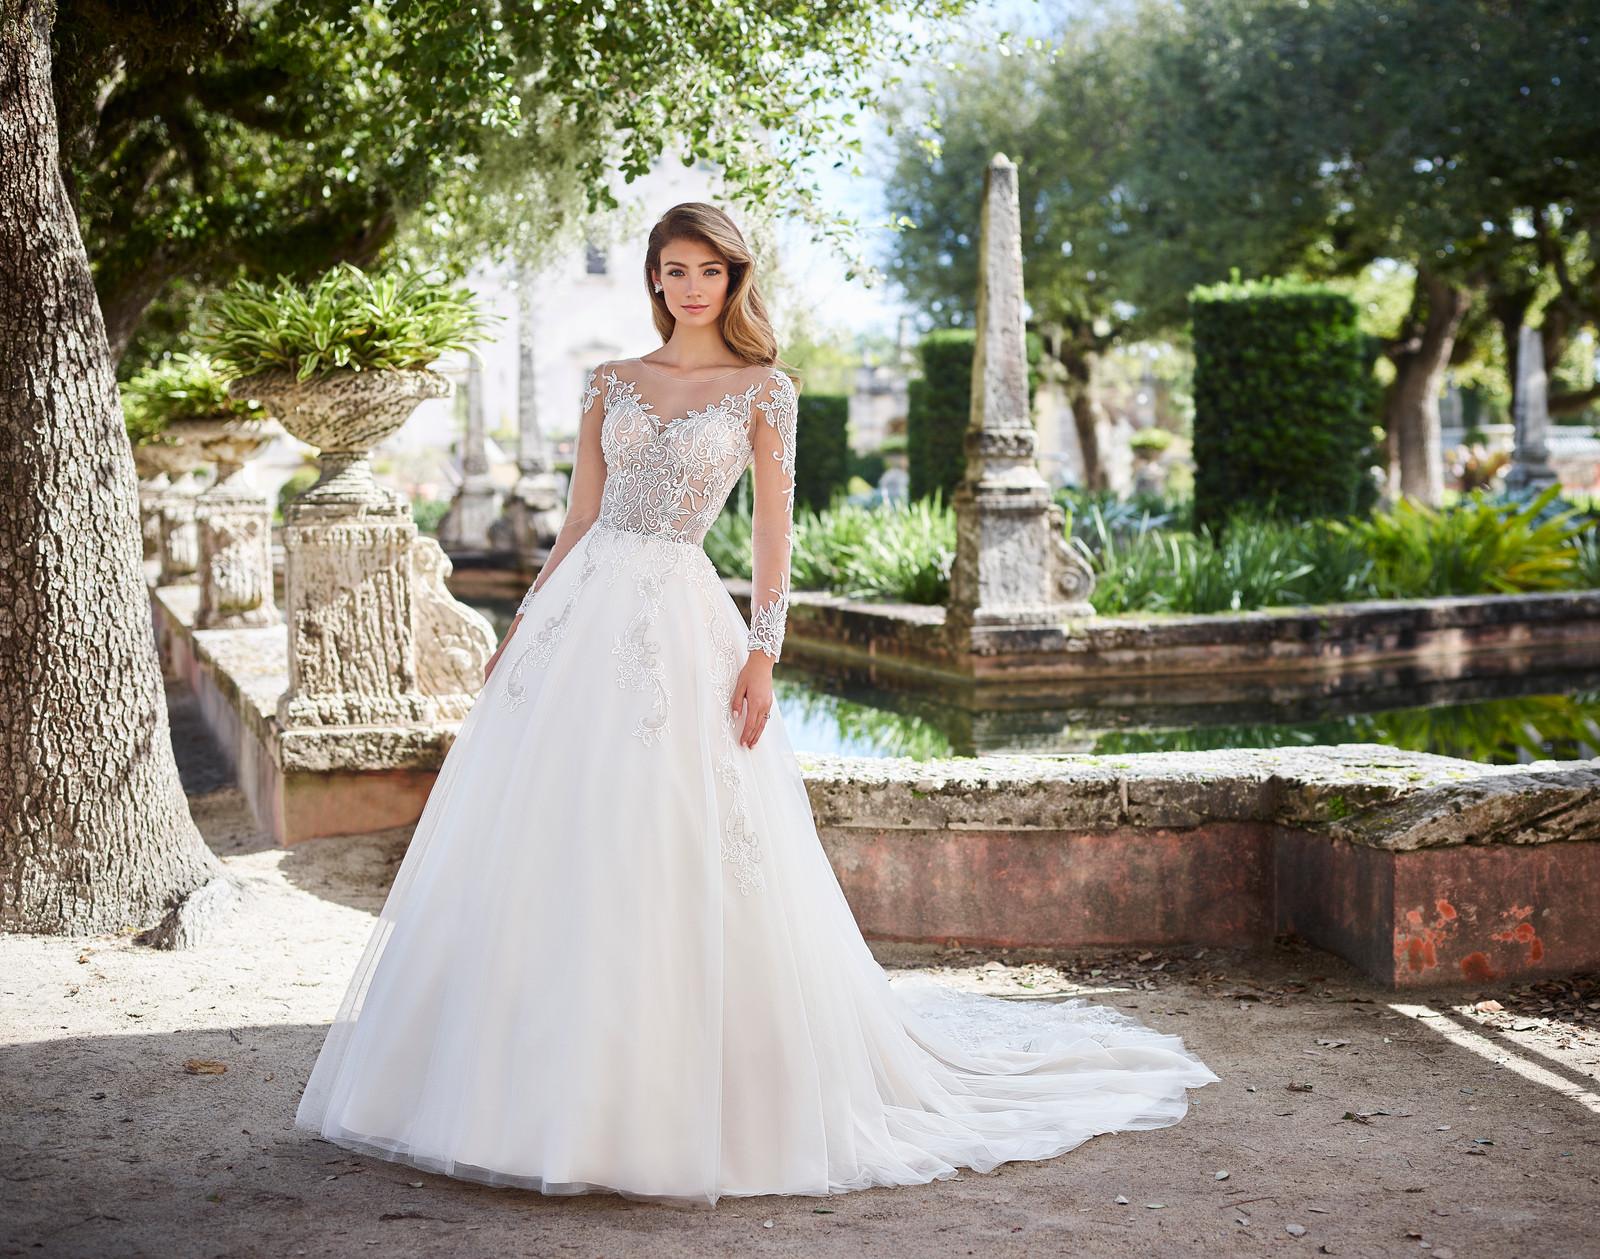 08bf7c7e79 Amour Bridal - Bridal Boutique in Cedar Park, TX